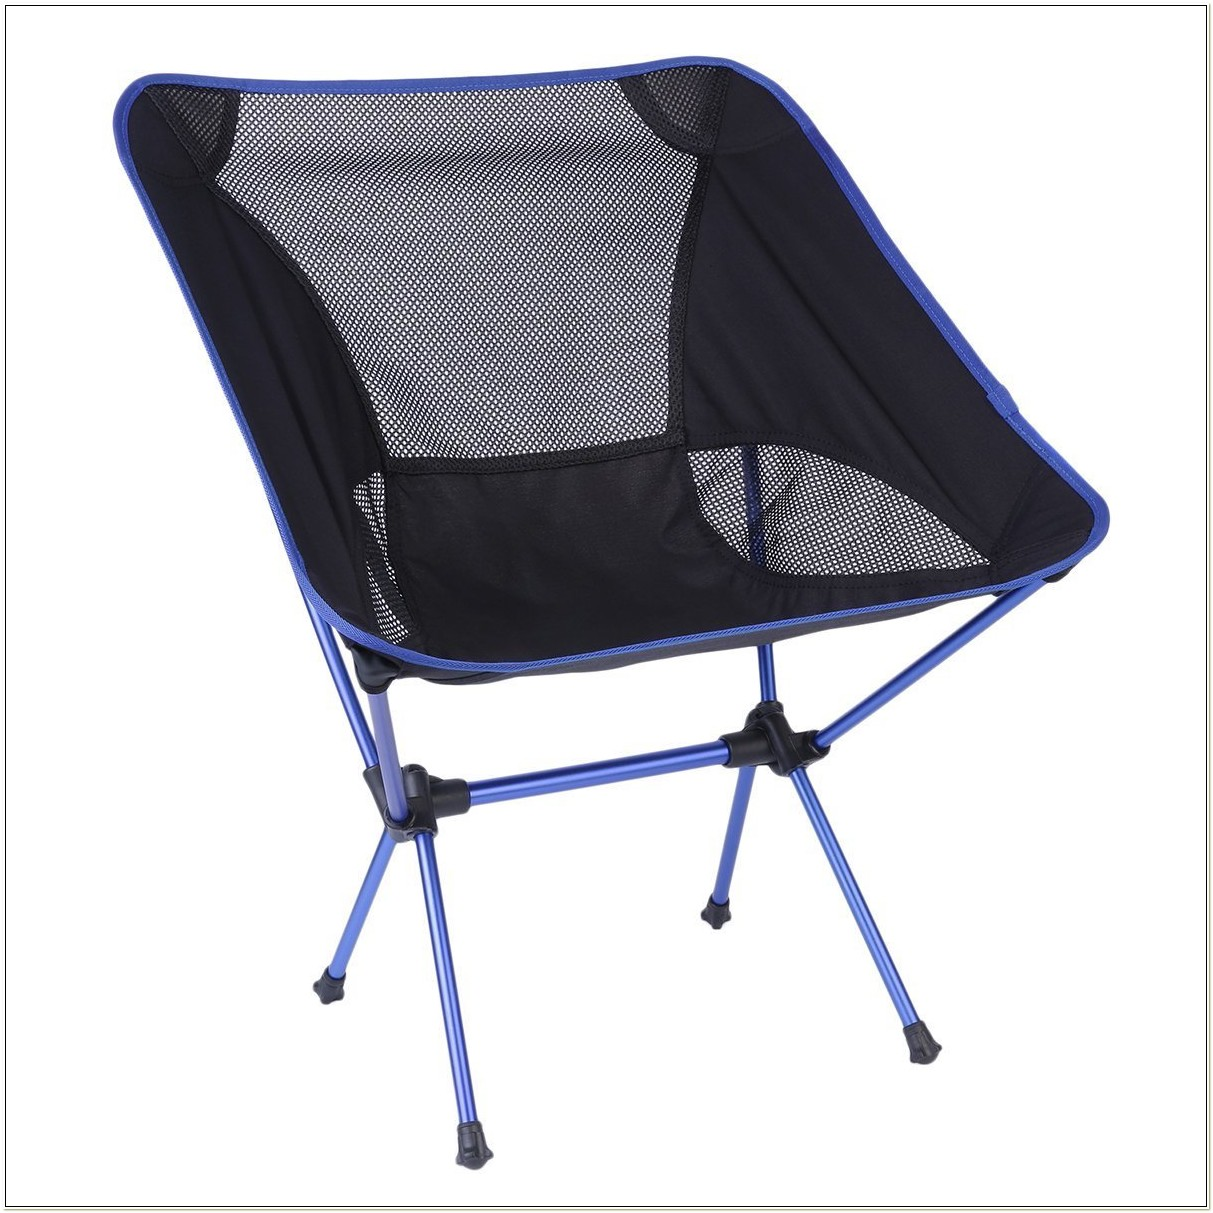 Heavy Duty Camp Chair Amazon